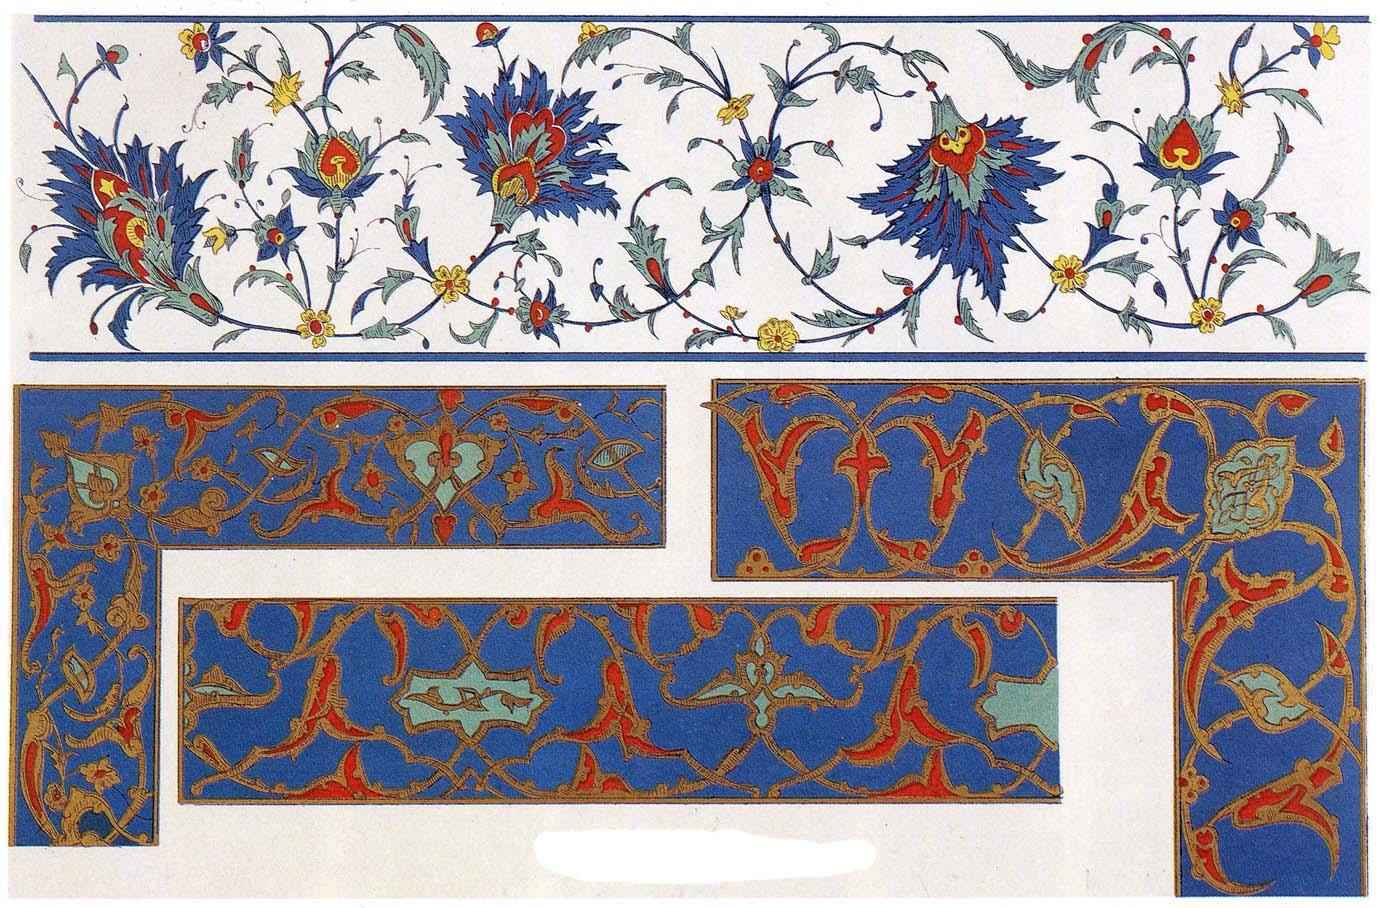 http://3.bp.blogspot.com/-U_uHVB176mM/TxRoJfu0FlI/AAAAAAAAKro/HPKdGTG9iMo/s1600/indo+persian+manuscript+borders.jpg